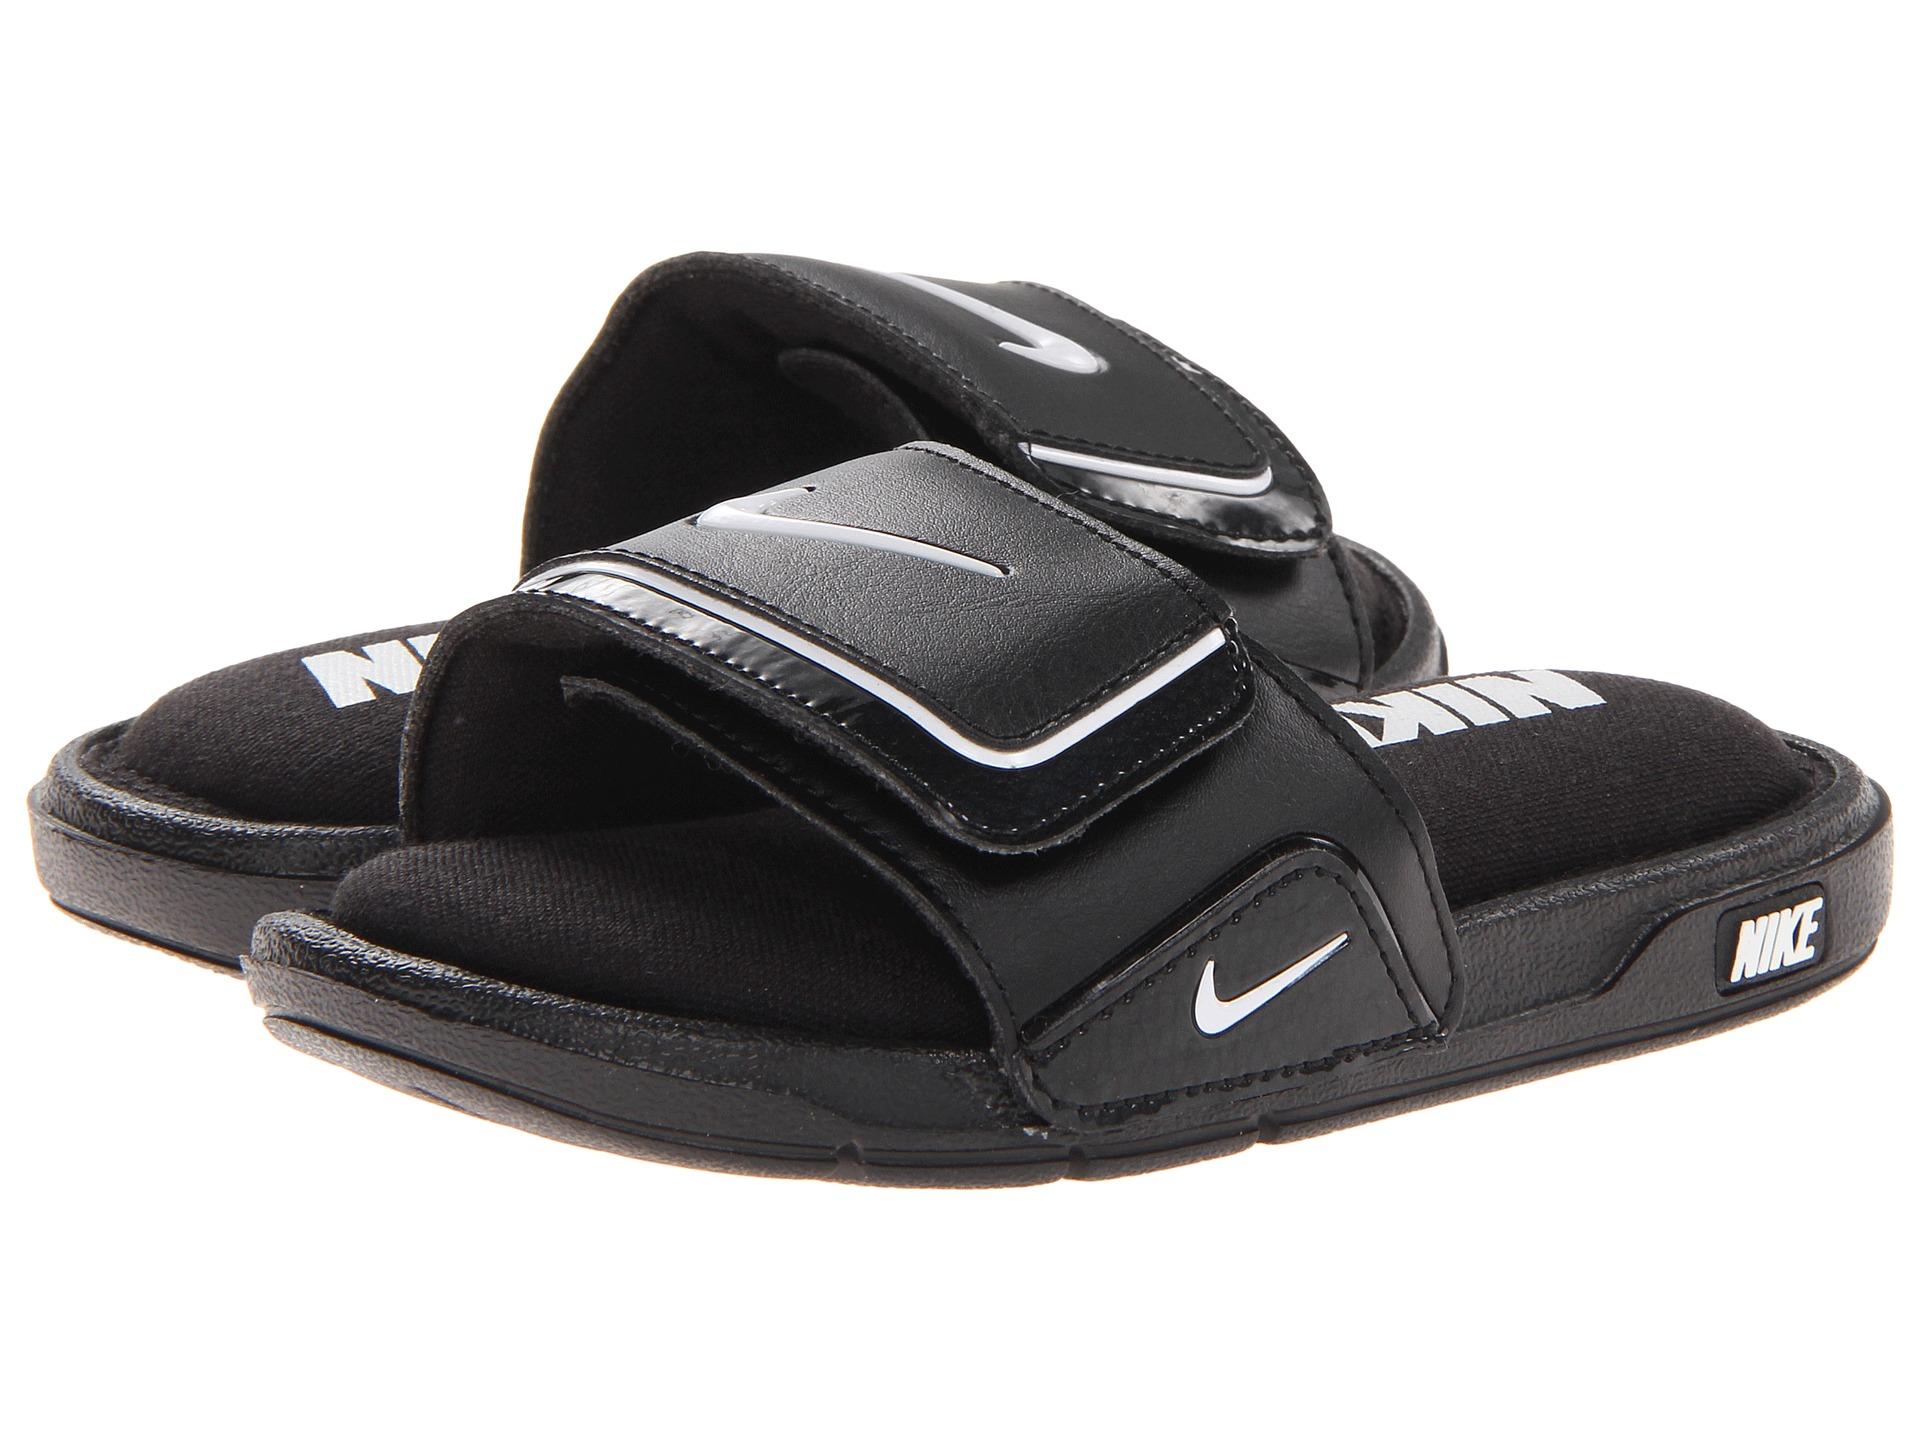 Baby Nike Slides